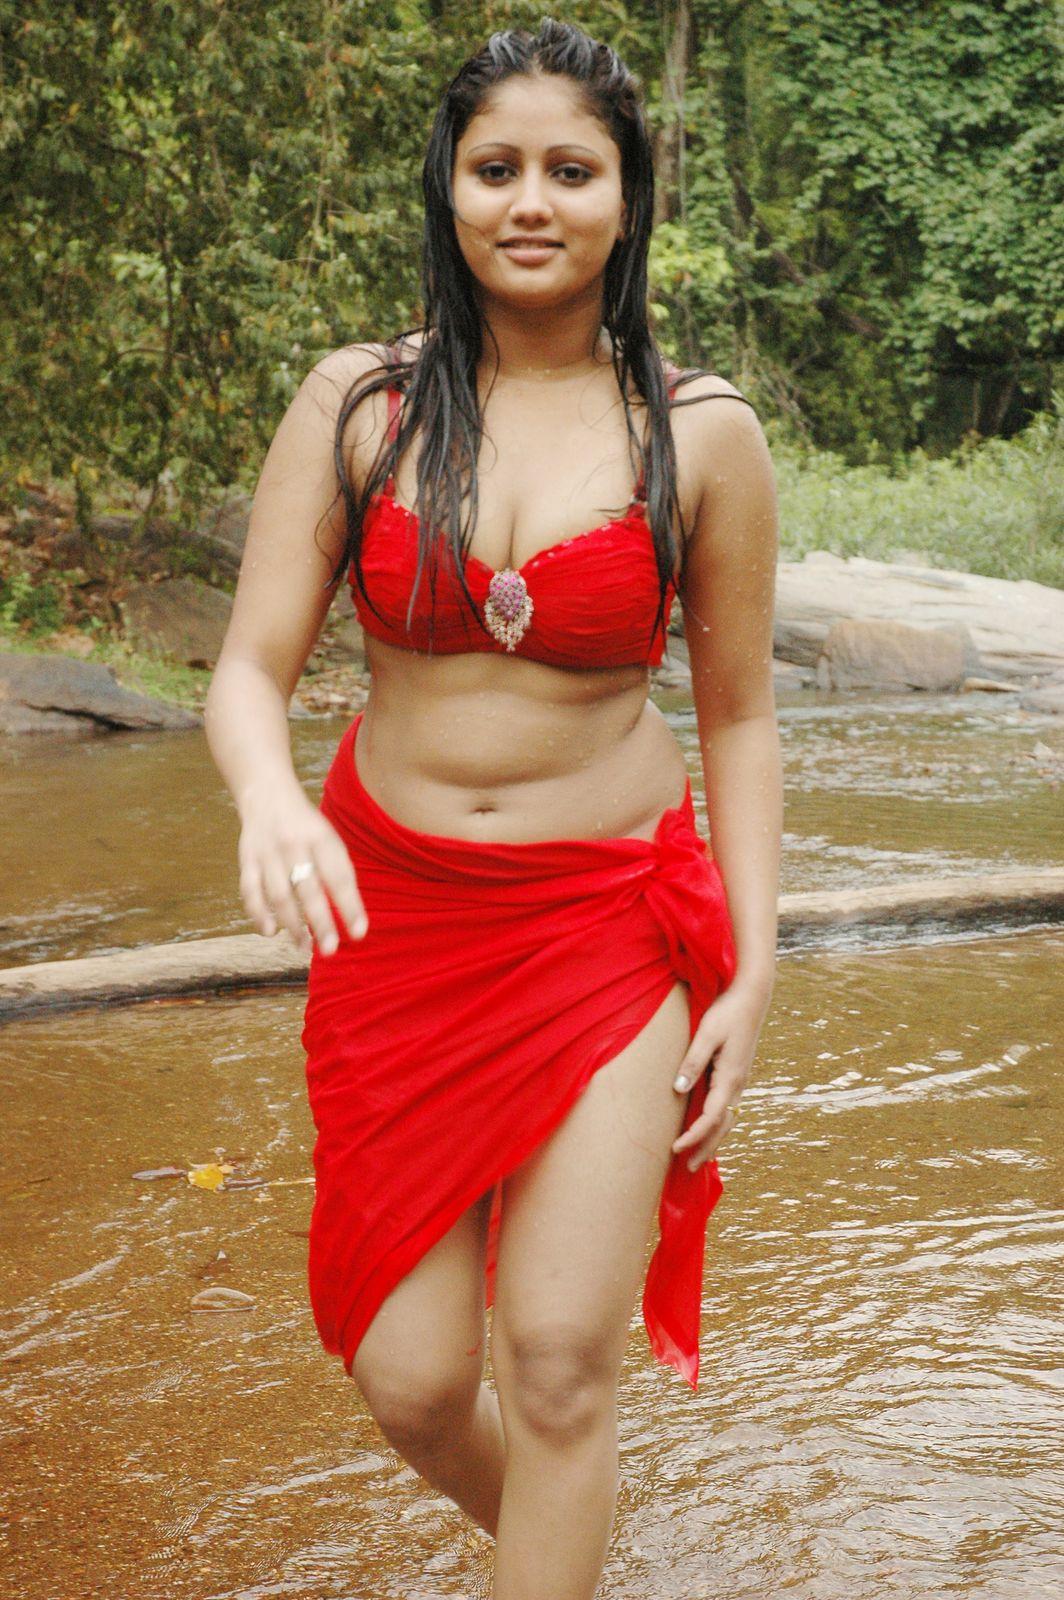 http://2.bp.blogspot.com/_9eem9ISZBQE/TOUxODja0oI/AAAAAAAAFaI/gOdUmLz08hw/s1600/macha+kanni+tamil+movie+hot+stills29.jpg